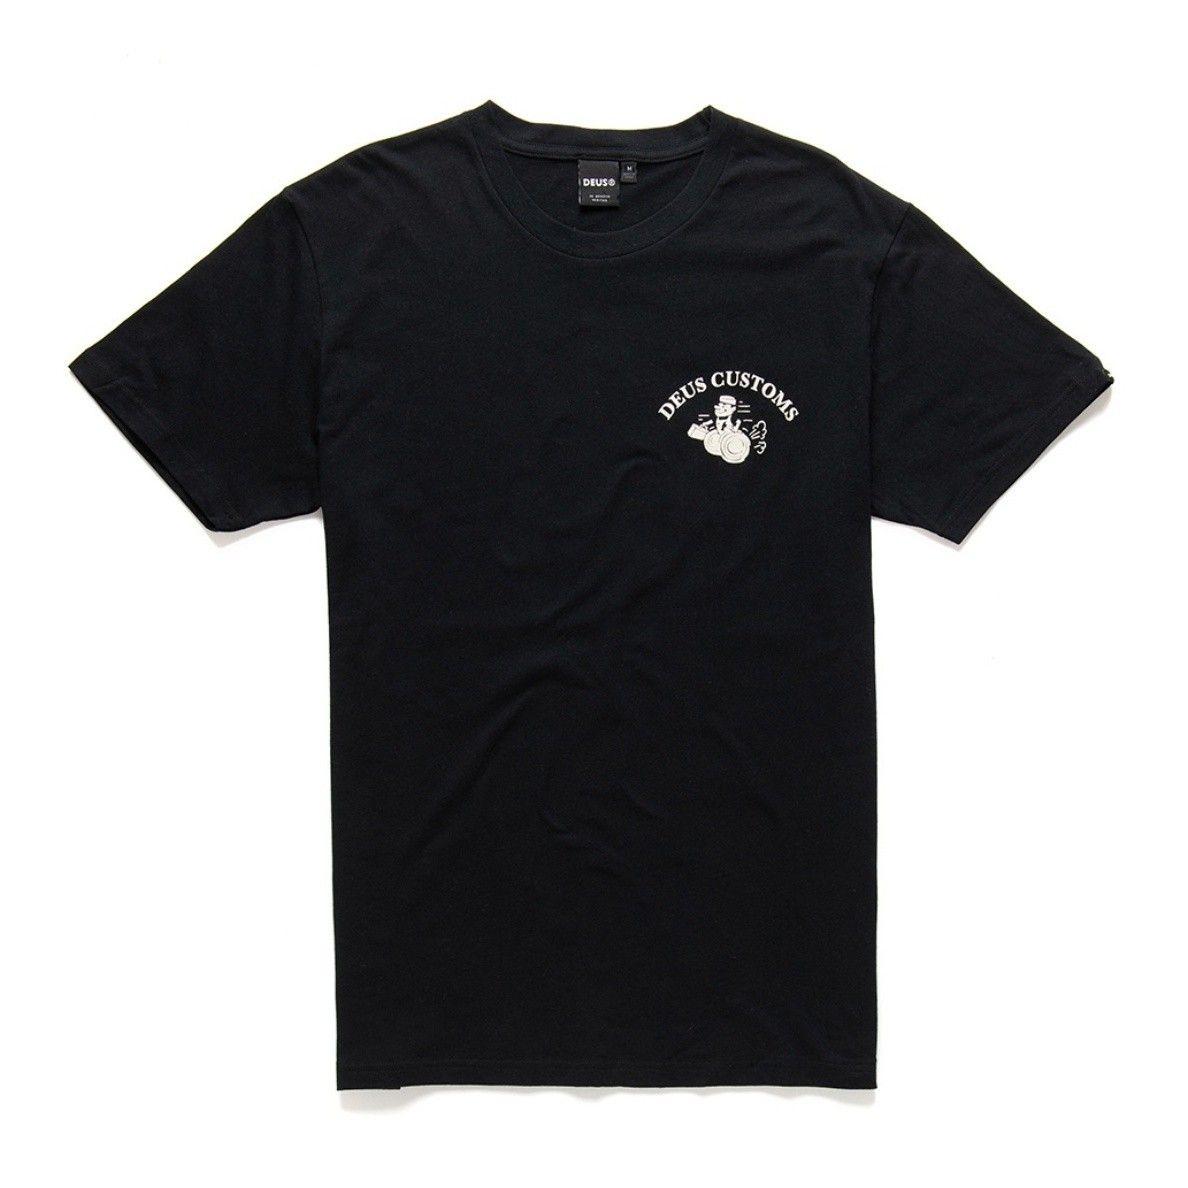 DEUS EX MACHINA - Herren T-Shirt - Gee Whiz Tee - Black